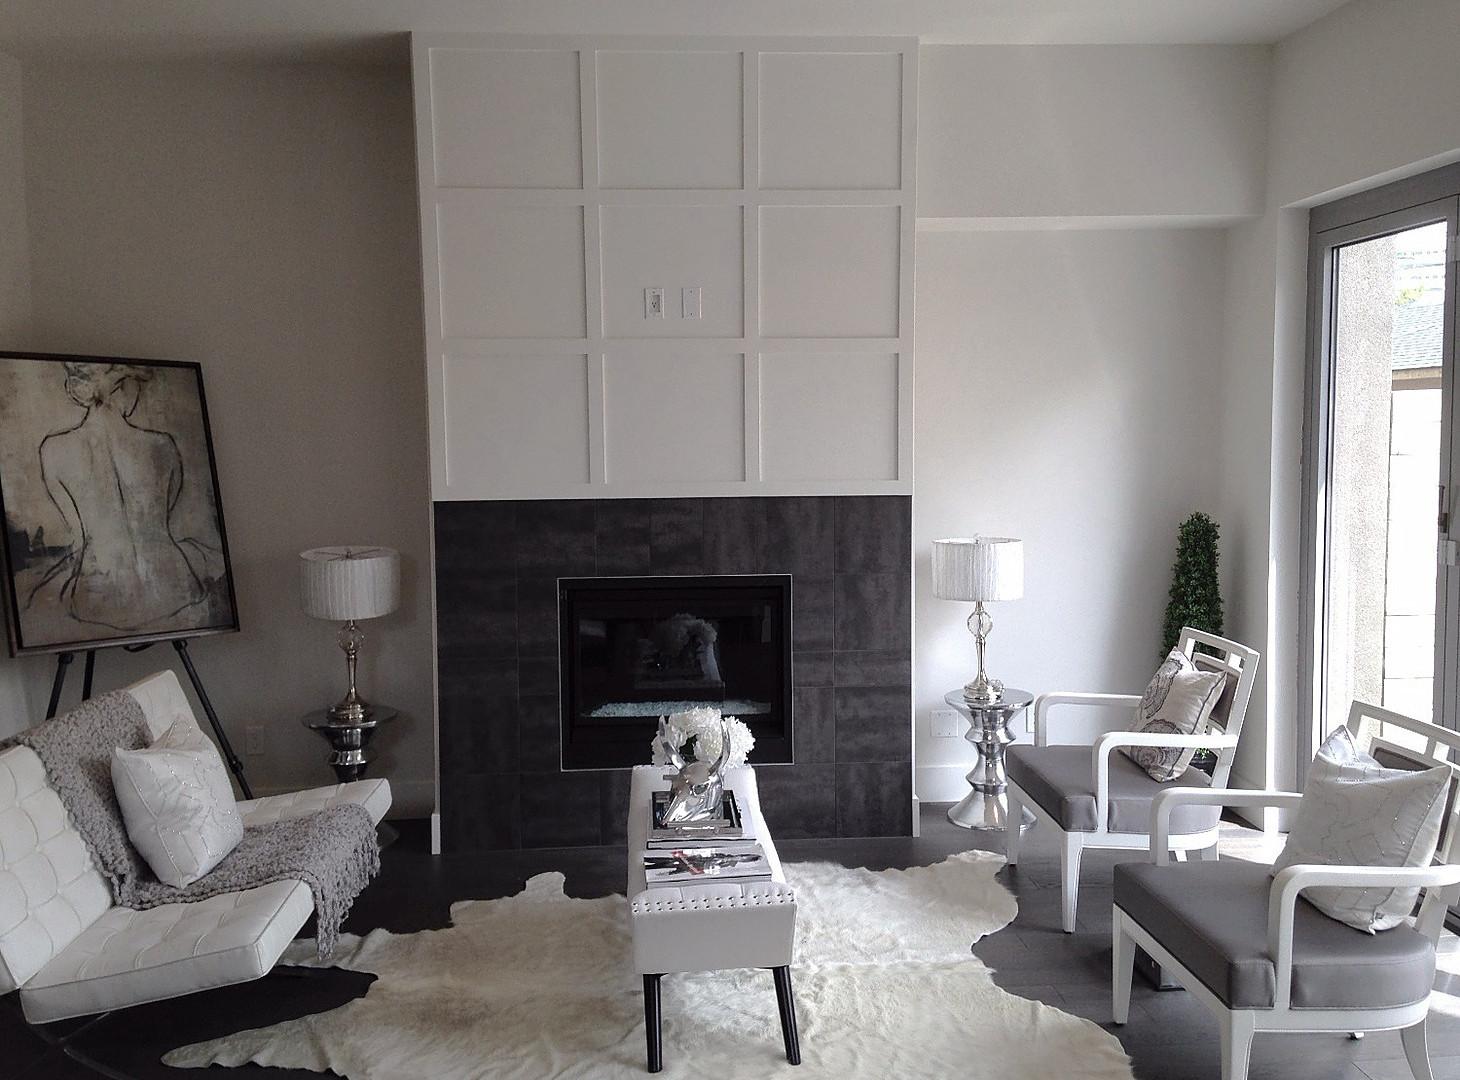 Single family home | Living room 3 - M8TRIX5 Development